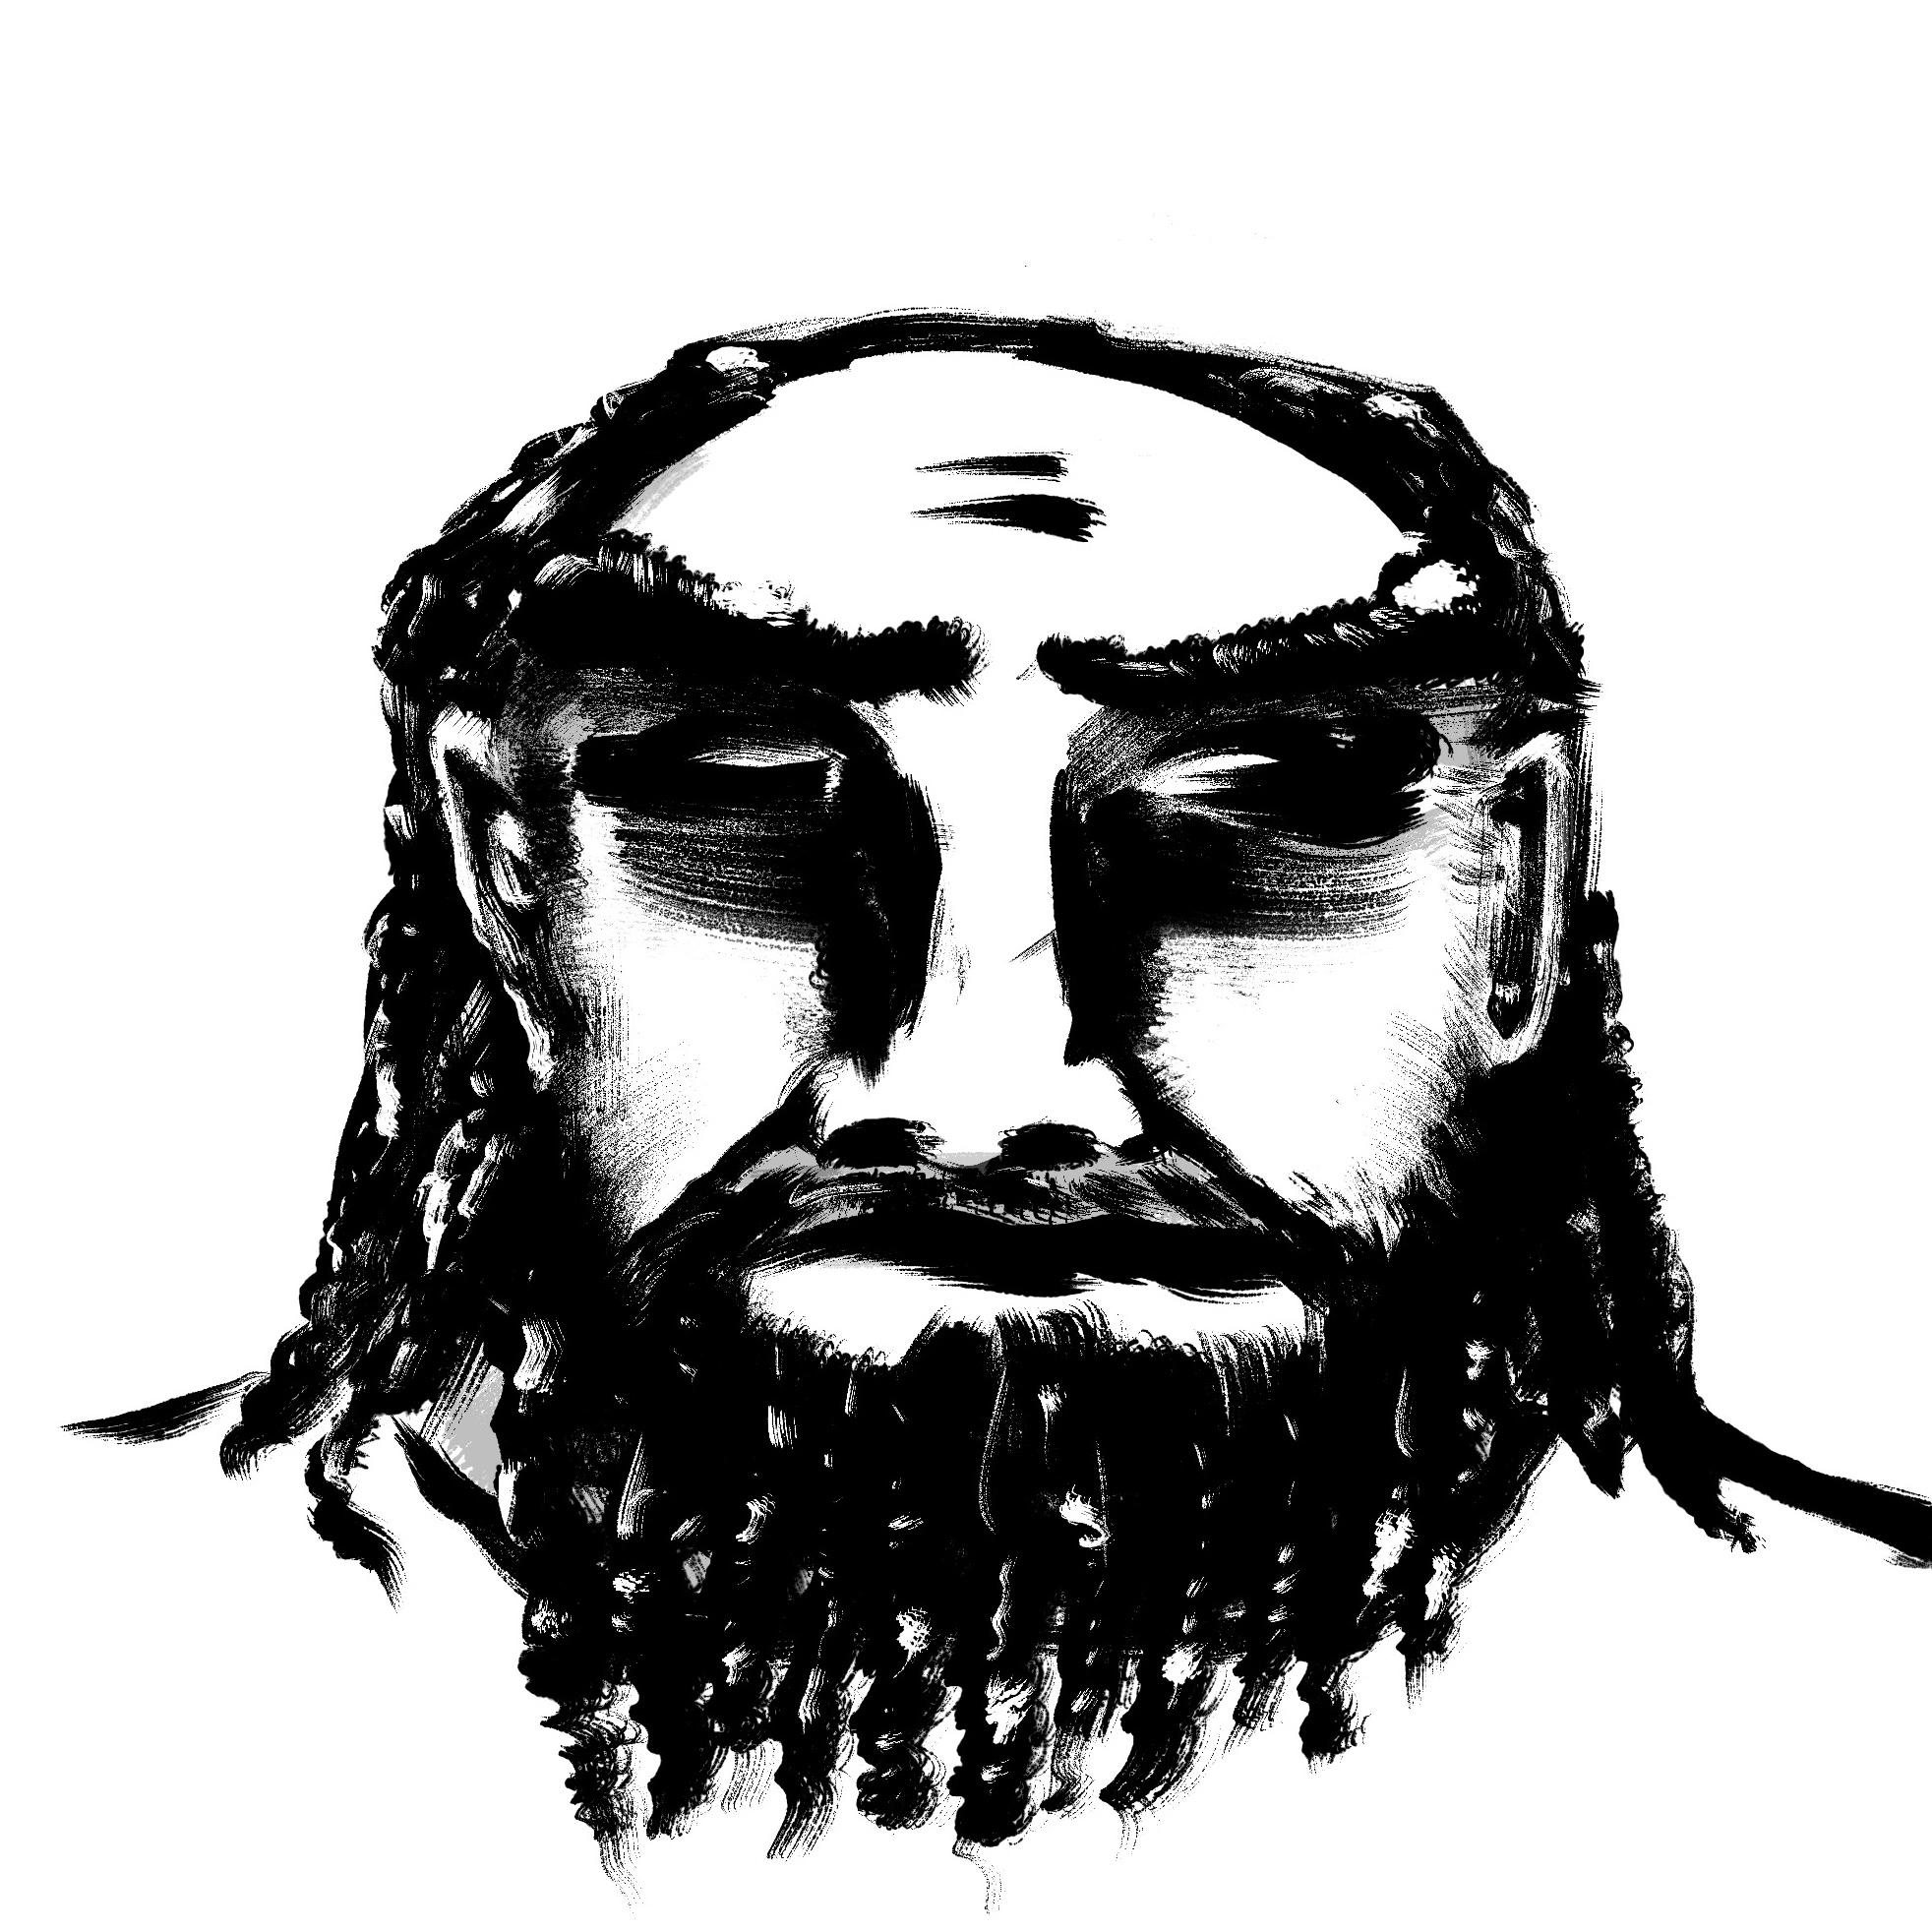 Mean dwarf